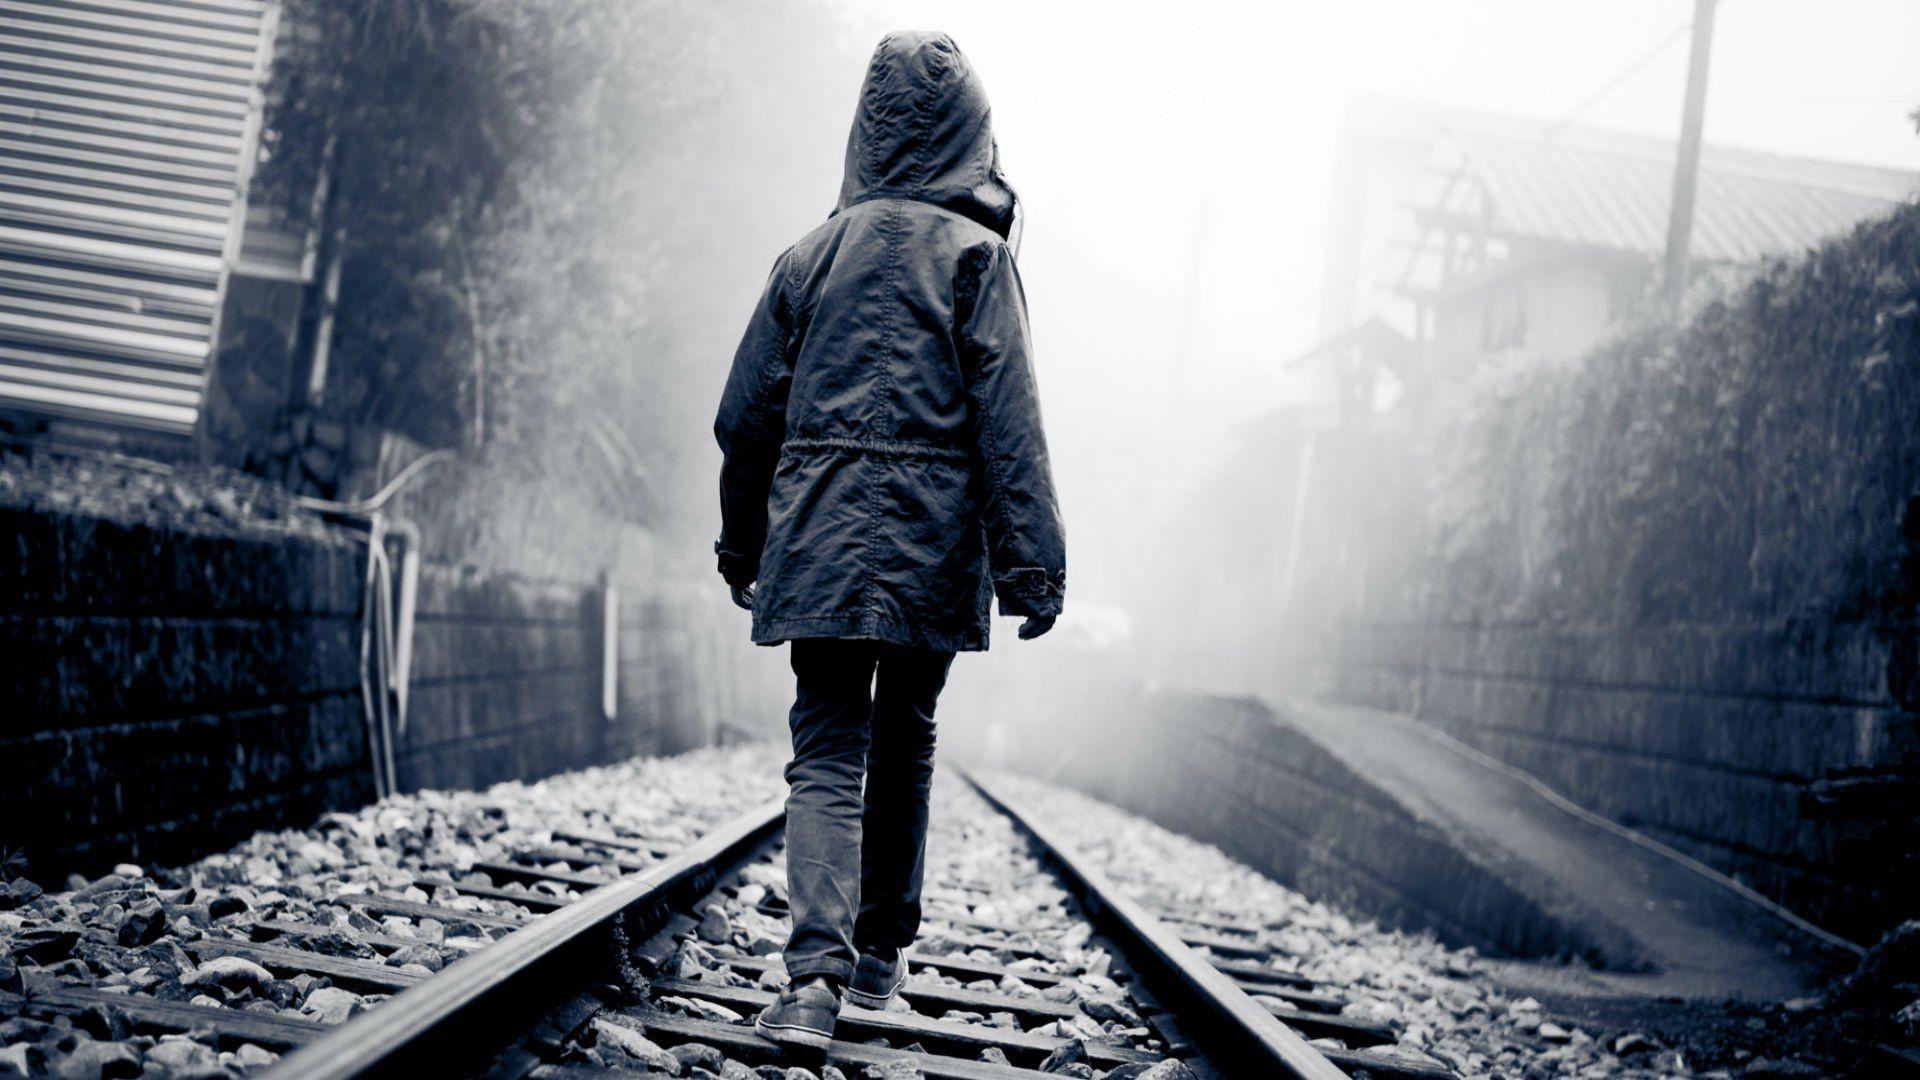 Sad And Alone: Sad Boy Wallpaper 2018 (64+ Images